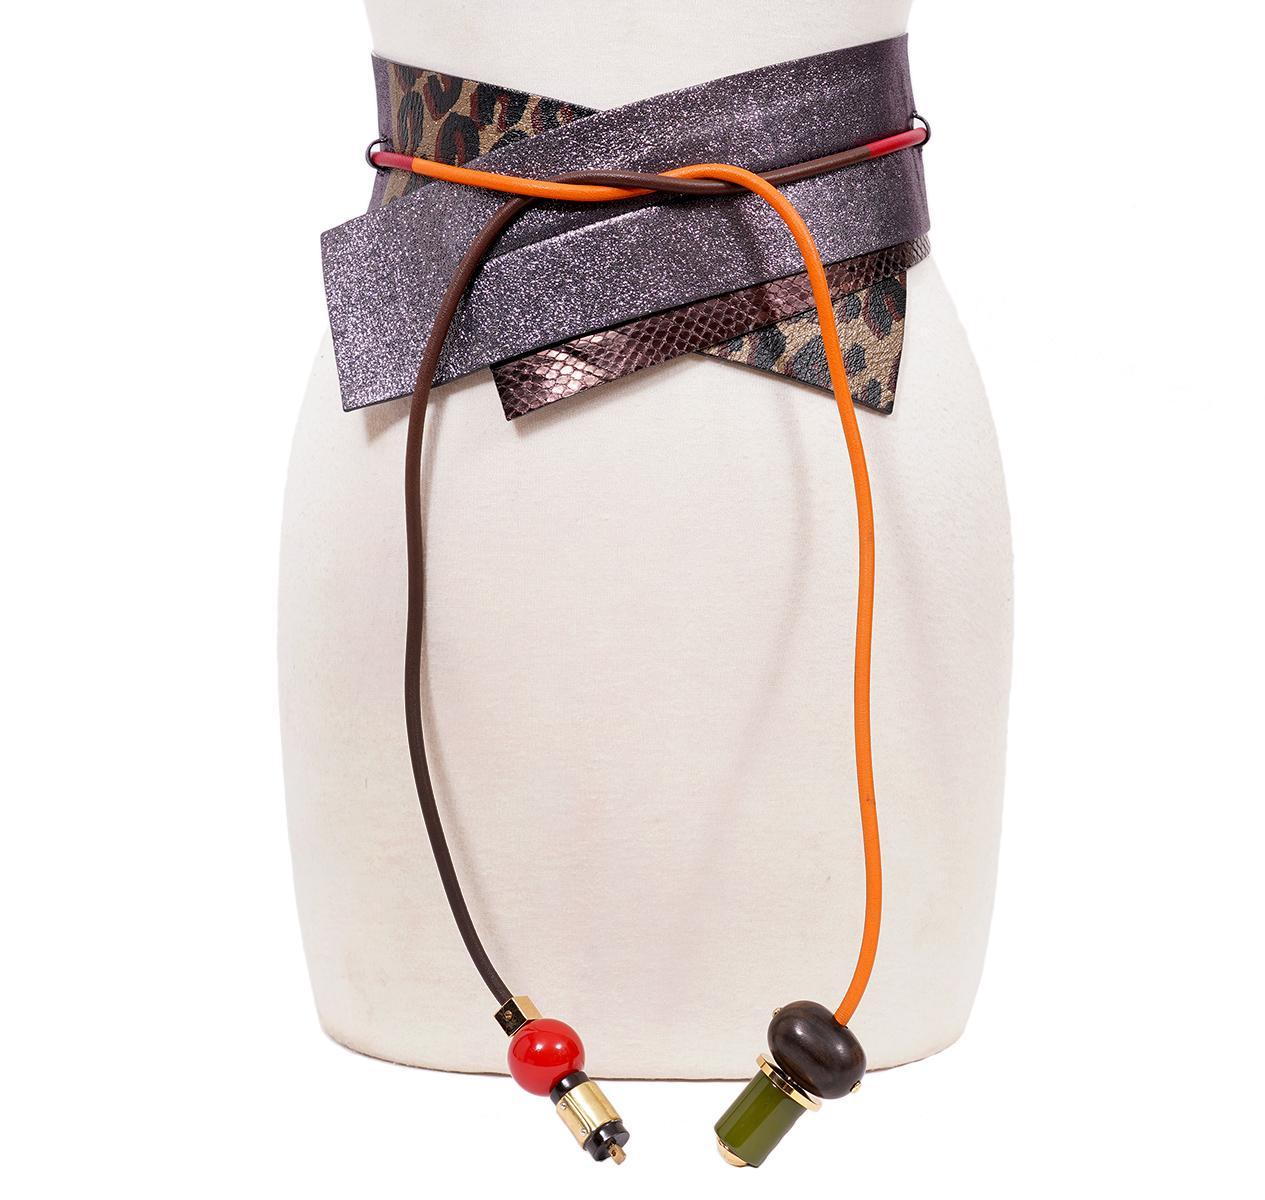 Louis Vuitton Vintage Metalic Tie Belt